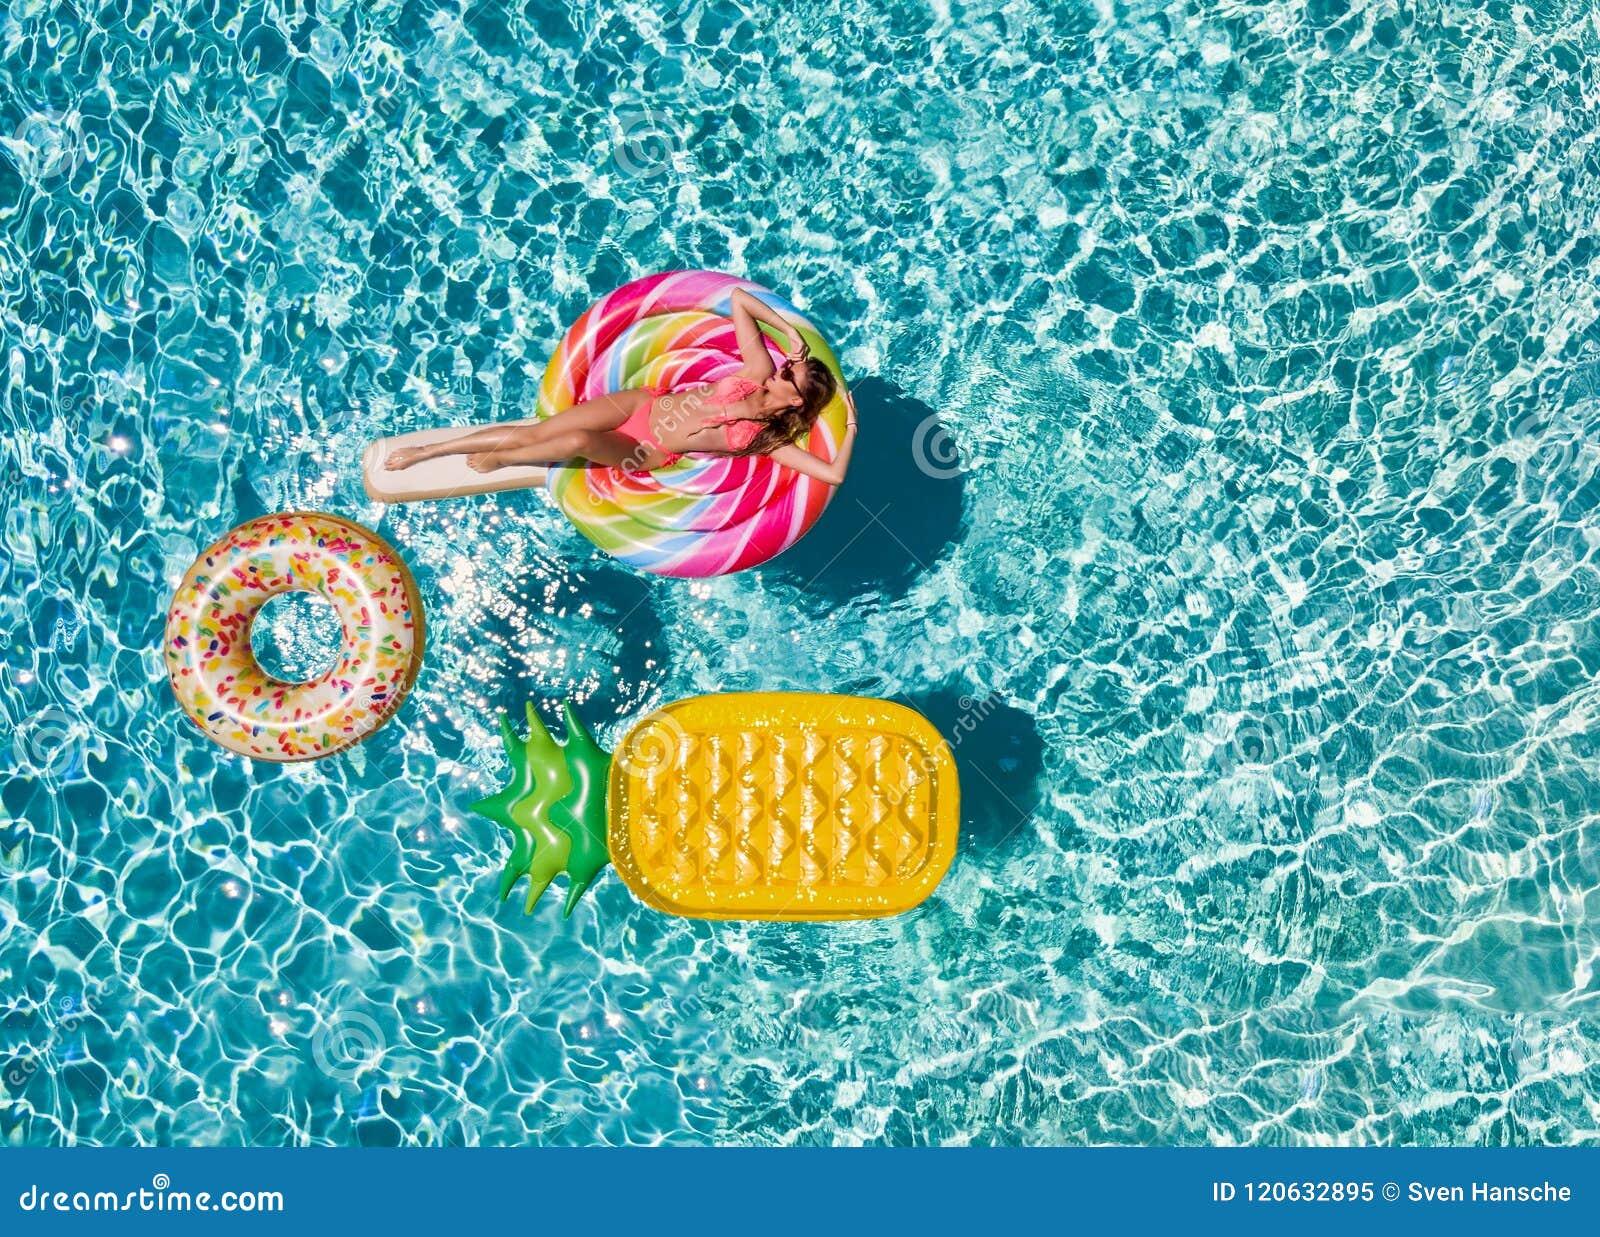 Woman in bikini relaxes on a lolli pop shaped swimming pool float